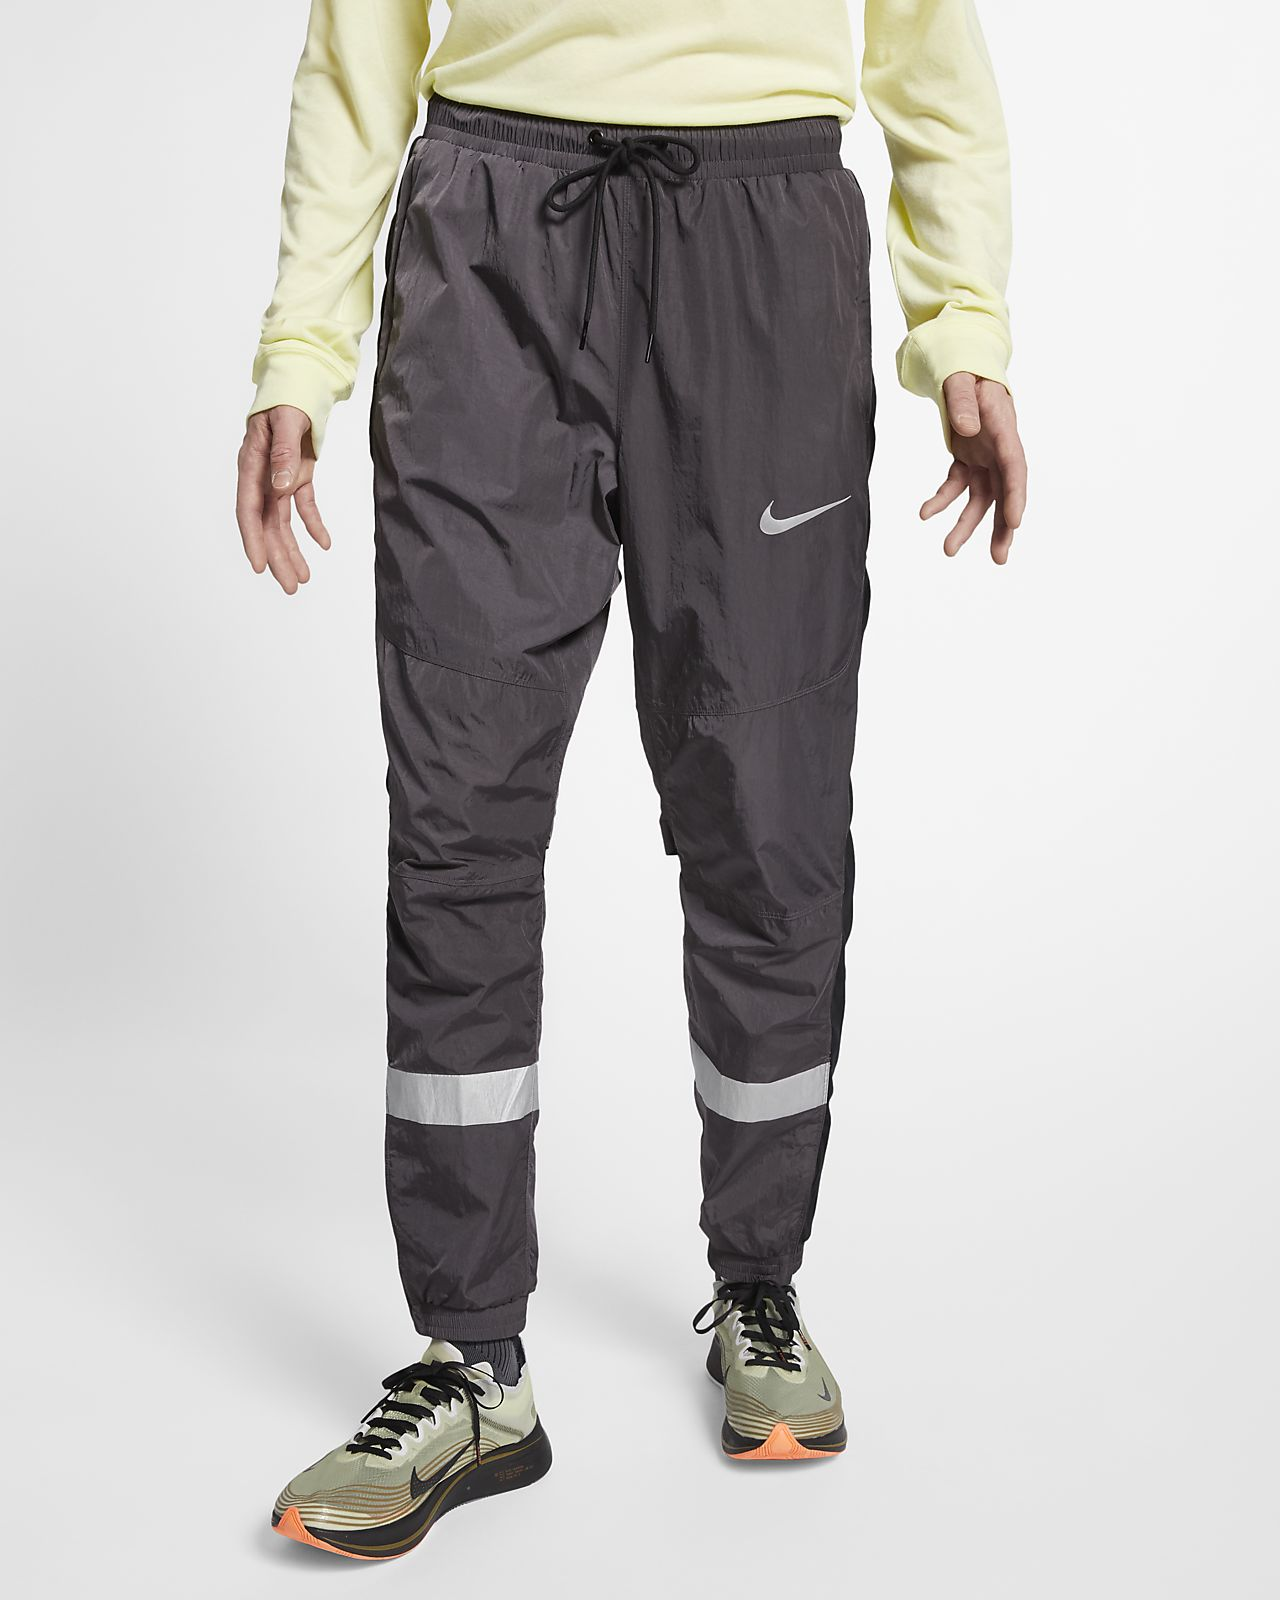 5c1b974f4b Low Resolution Nike férfi melegítőnadrág futáshoz Nike férfi melegítőnadrág  futáshoz